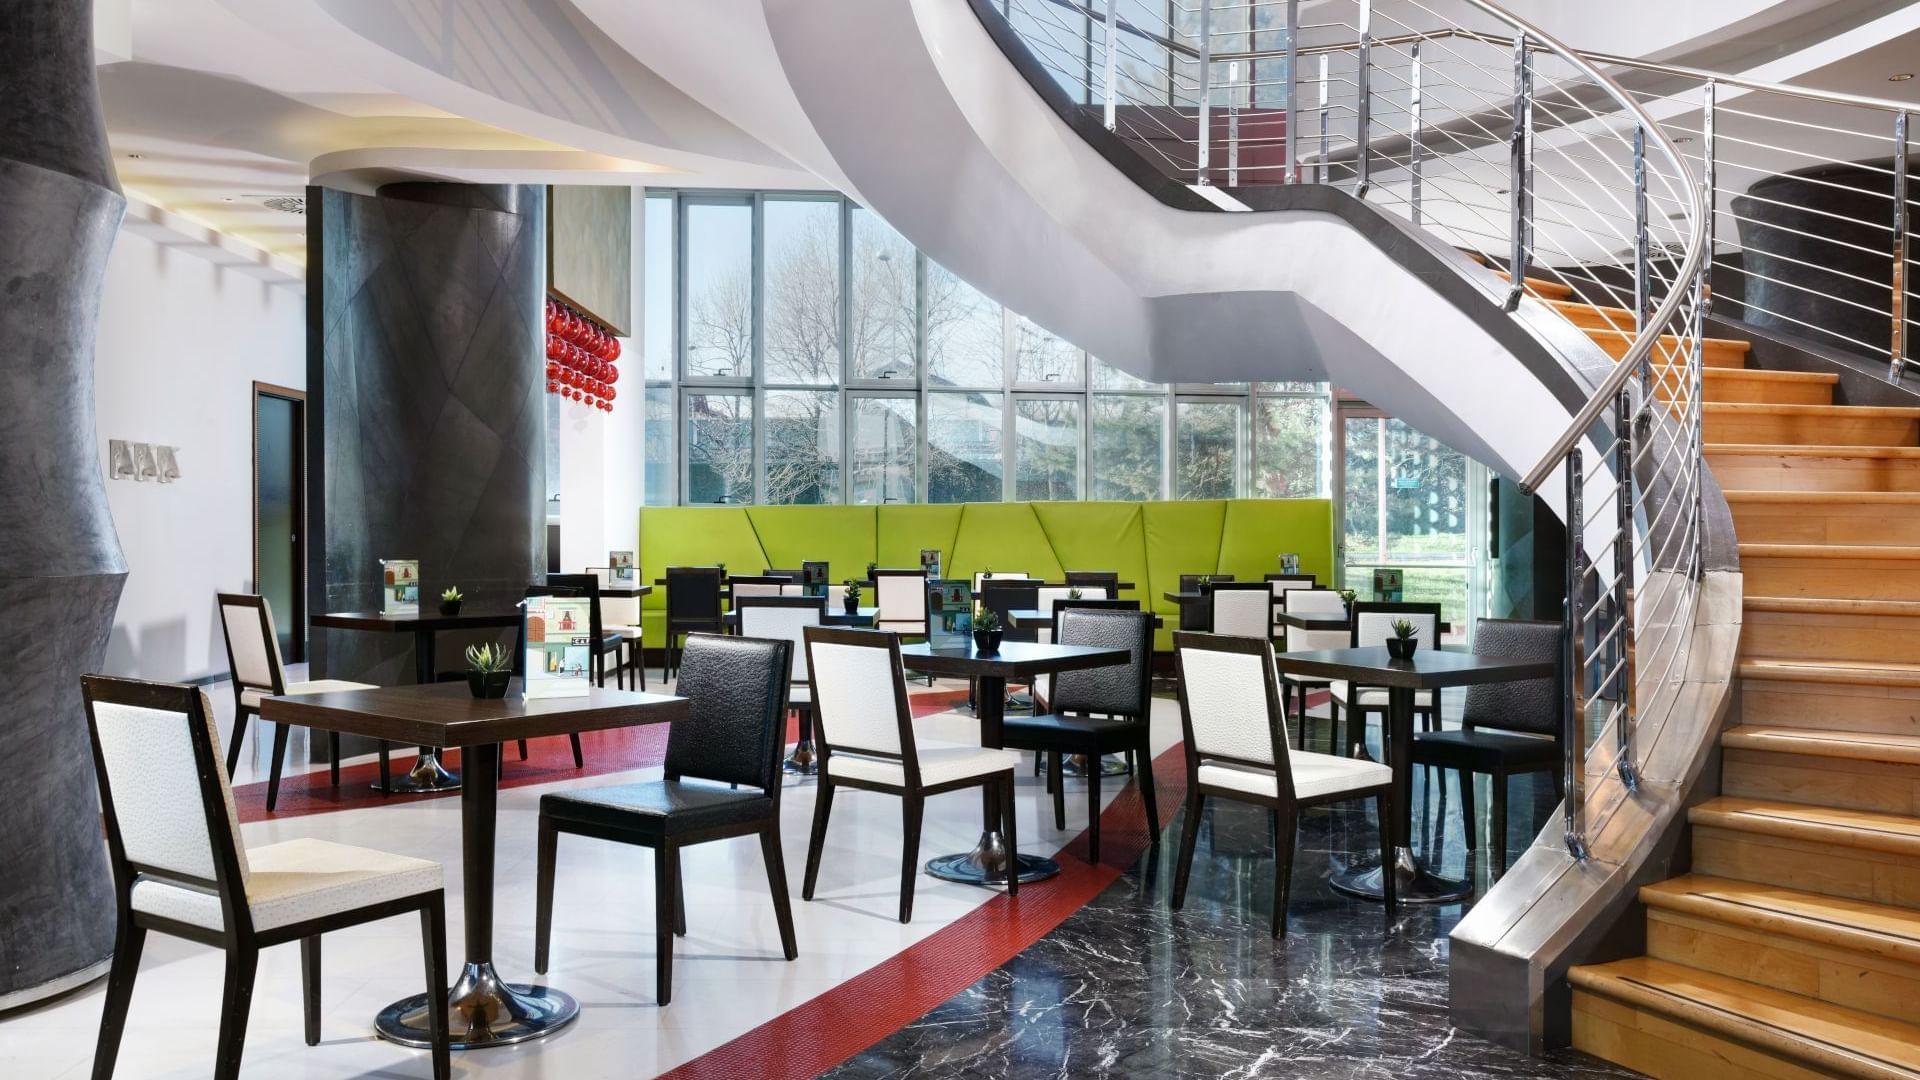 Taste traditional italian and international cuisine at the hotel restaurant.